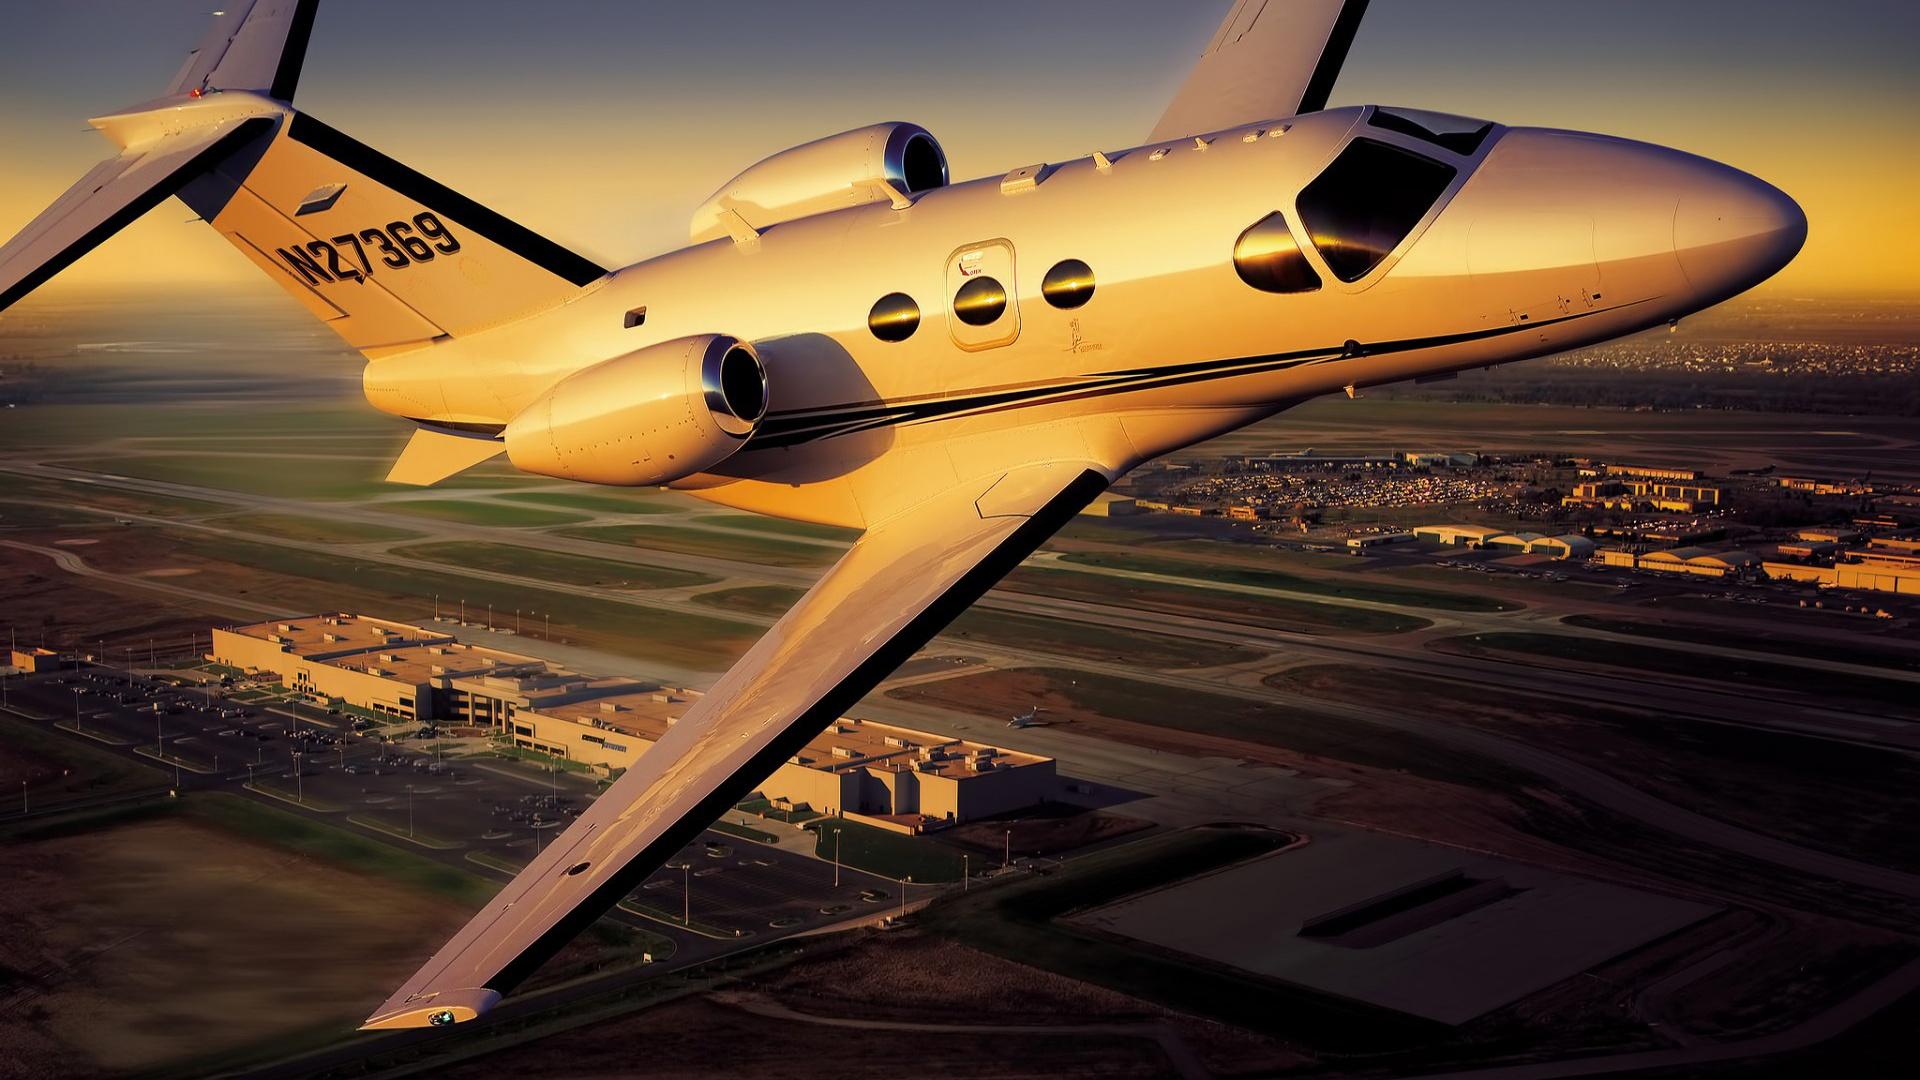 Cessna Wallpaper 1900 X 1080